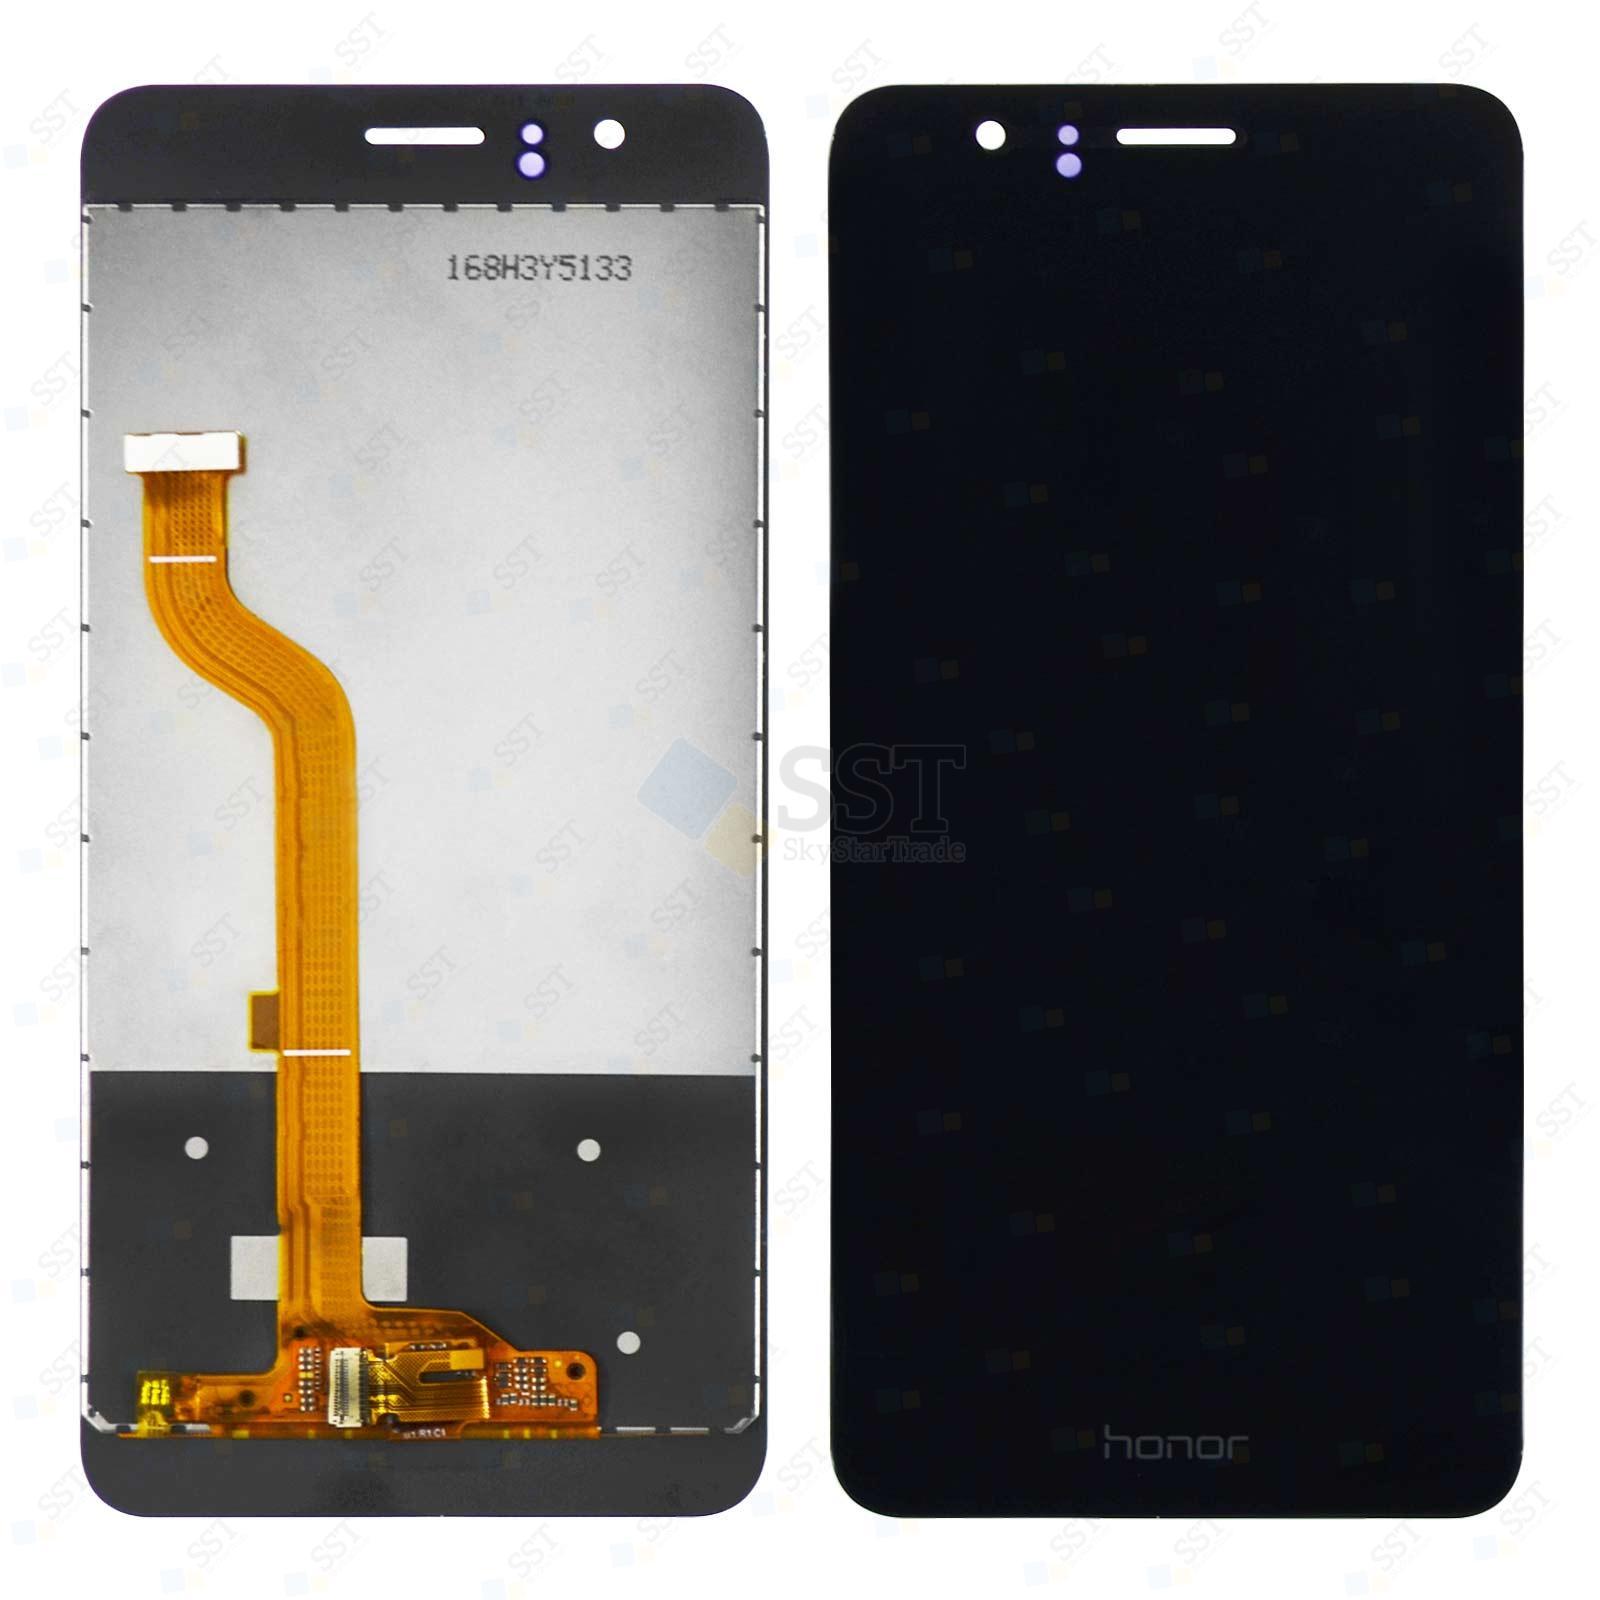 Huawei Honor 8 FRD-AL00 L02 L04 L09 TL00 FRD-L14 L19 AL10 LCD Screen Digitizer, Black